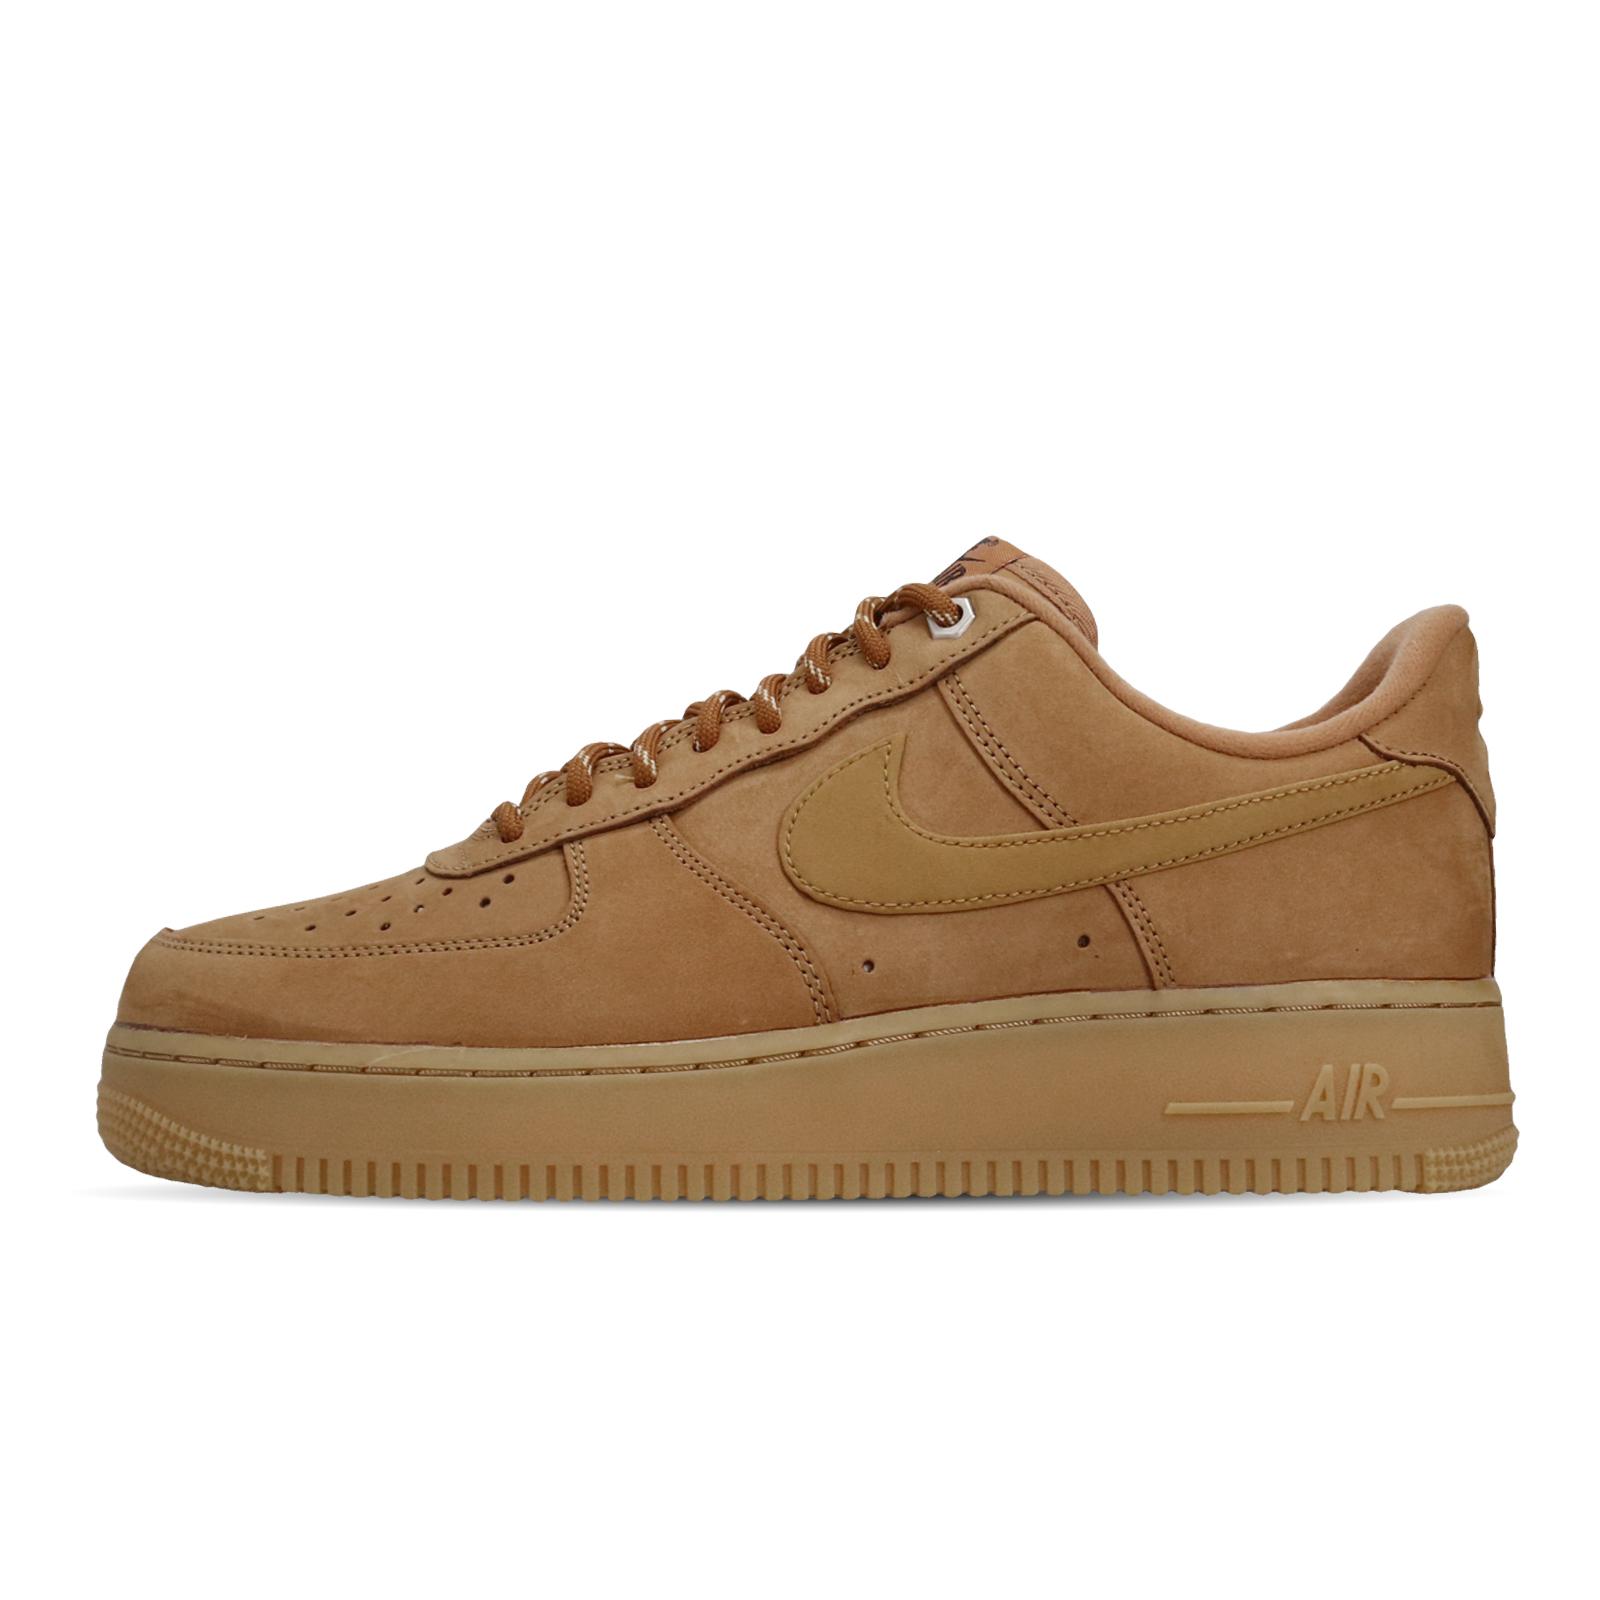 Nike 休閒鞋 Air Force 1 07 WB Wheat 小麥 土色 男鞋 AF1 ACS CJ9179-200